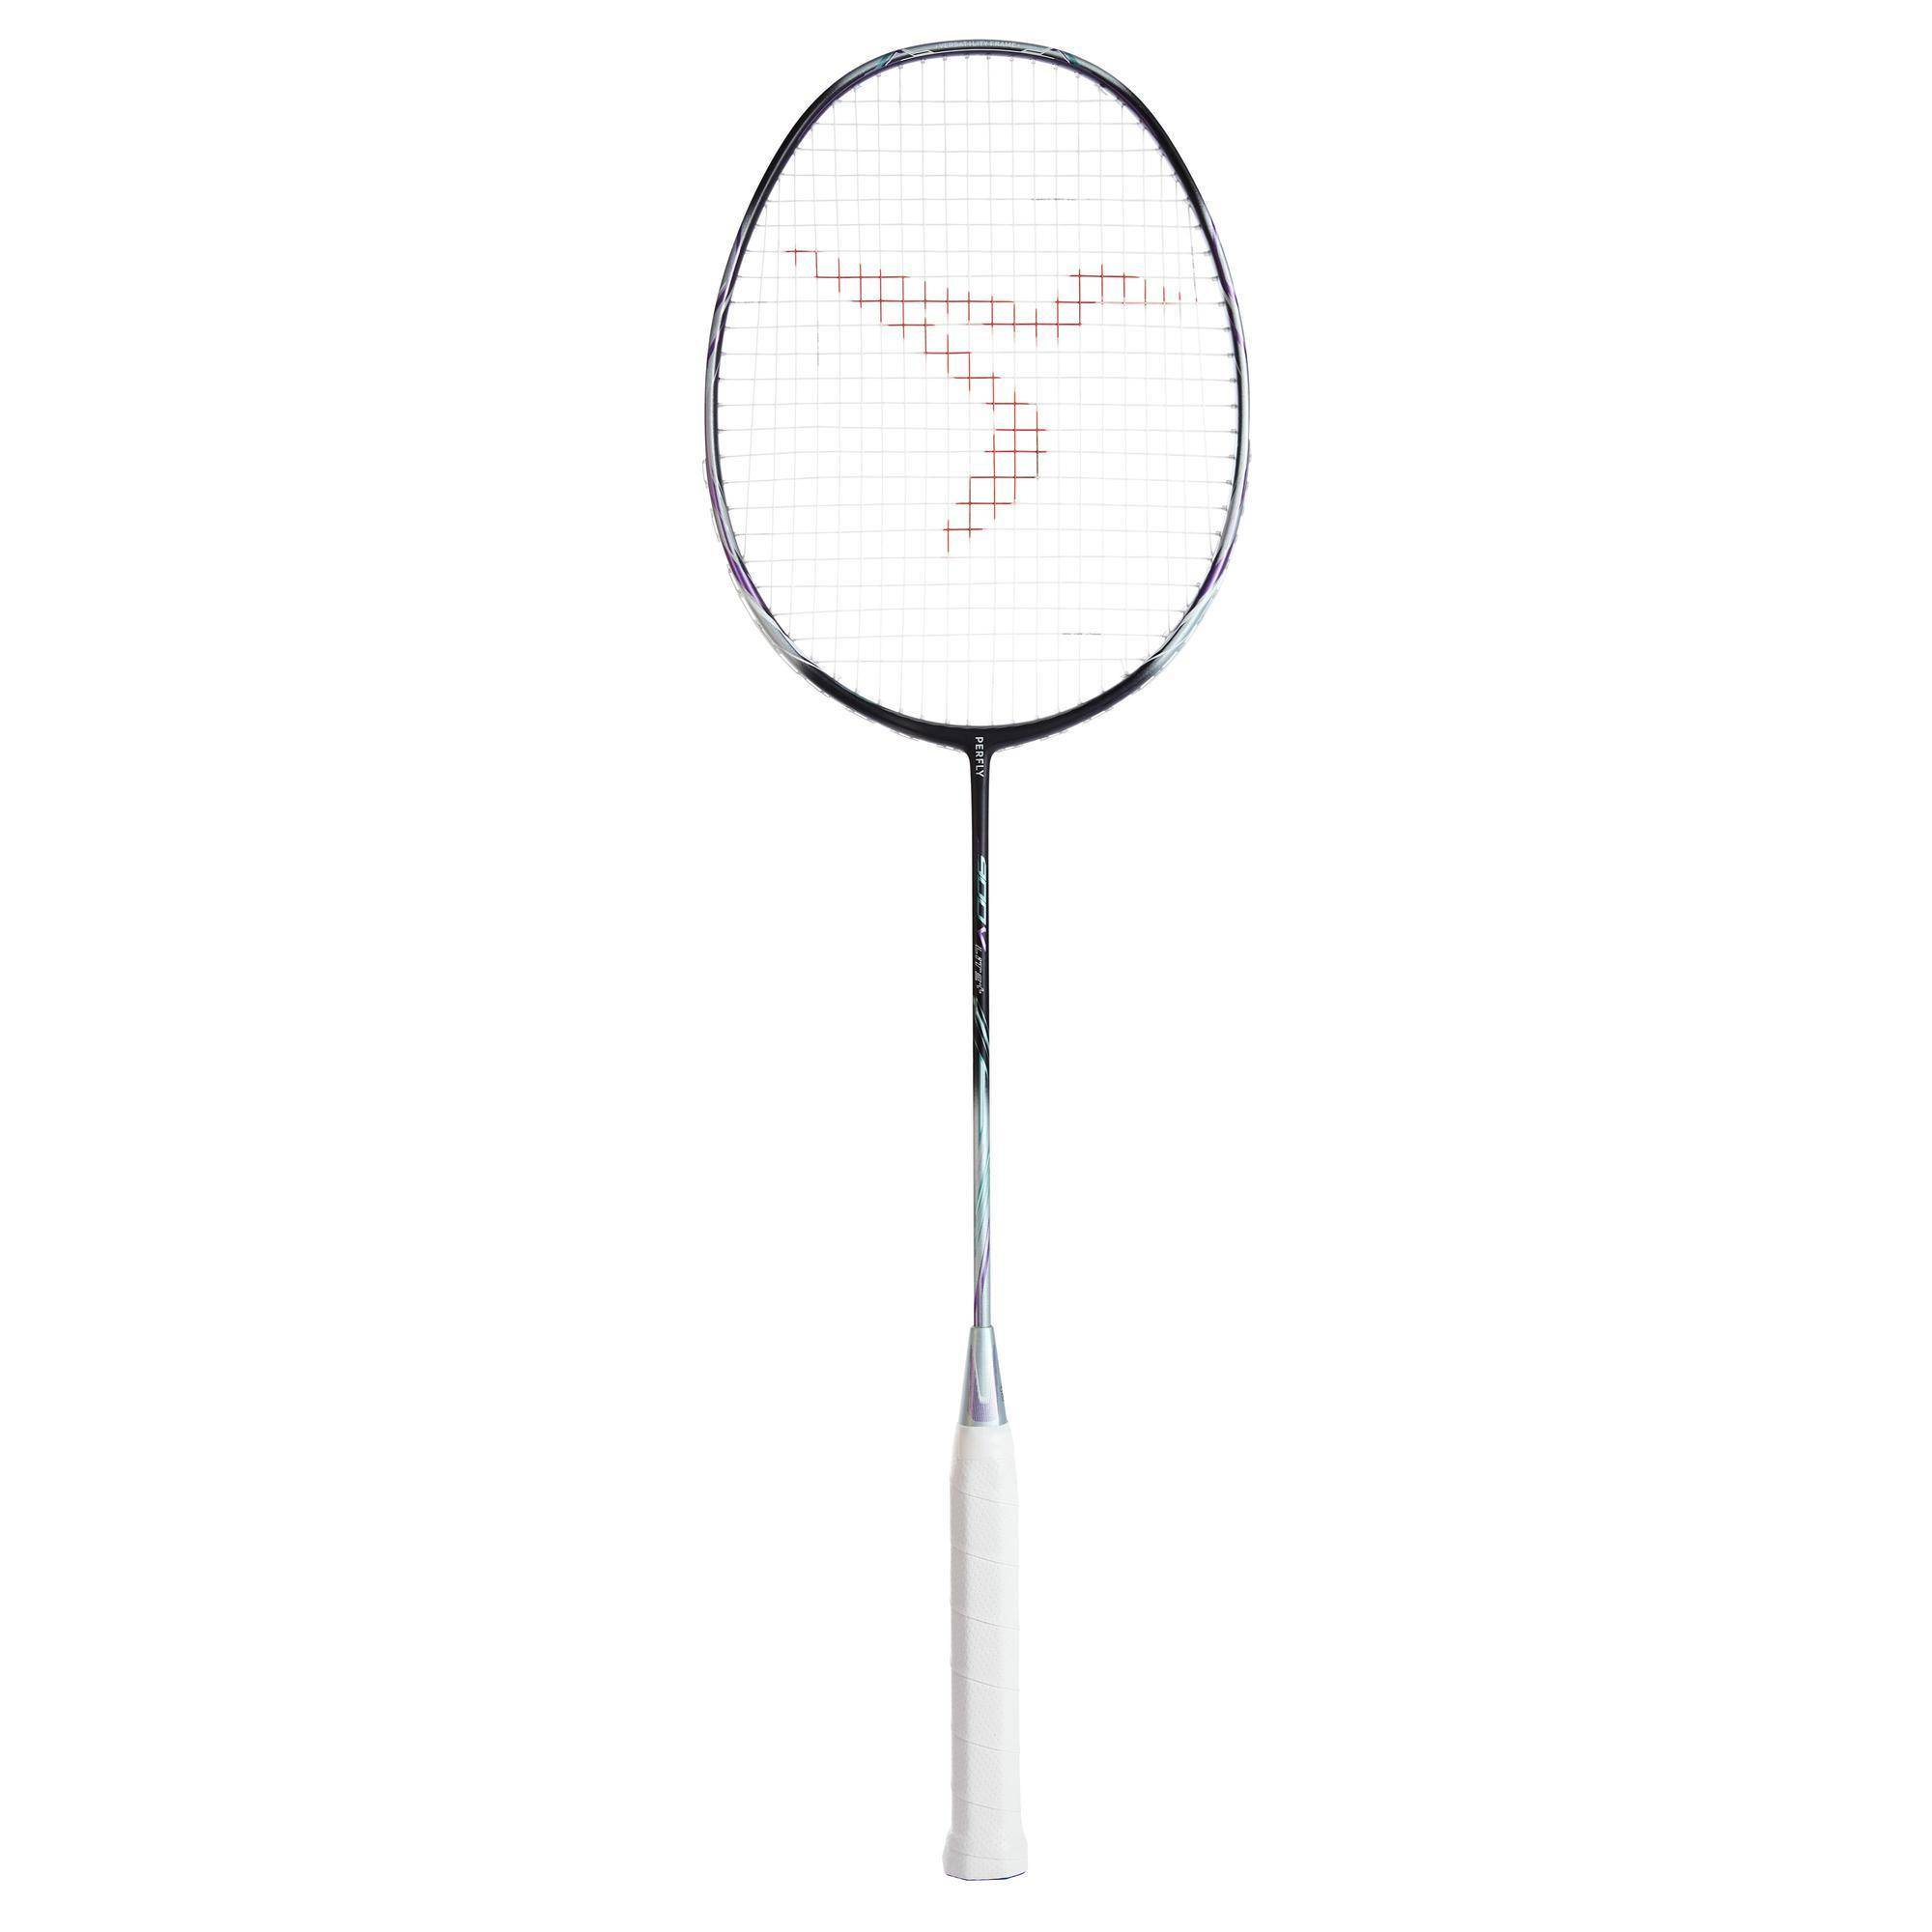 Perfly Raquette de Badminton Adulte BR 900 Ultra Lite V - Menthe - Perfly